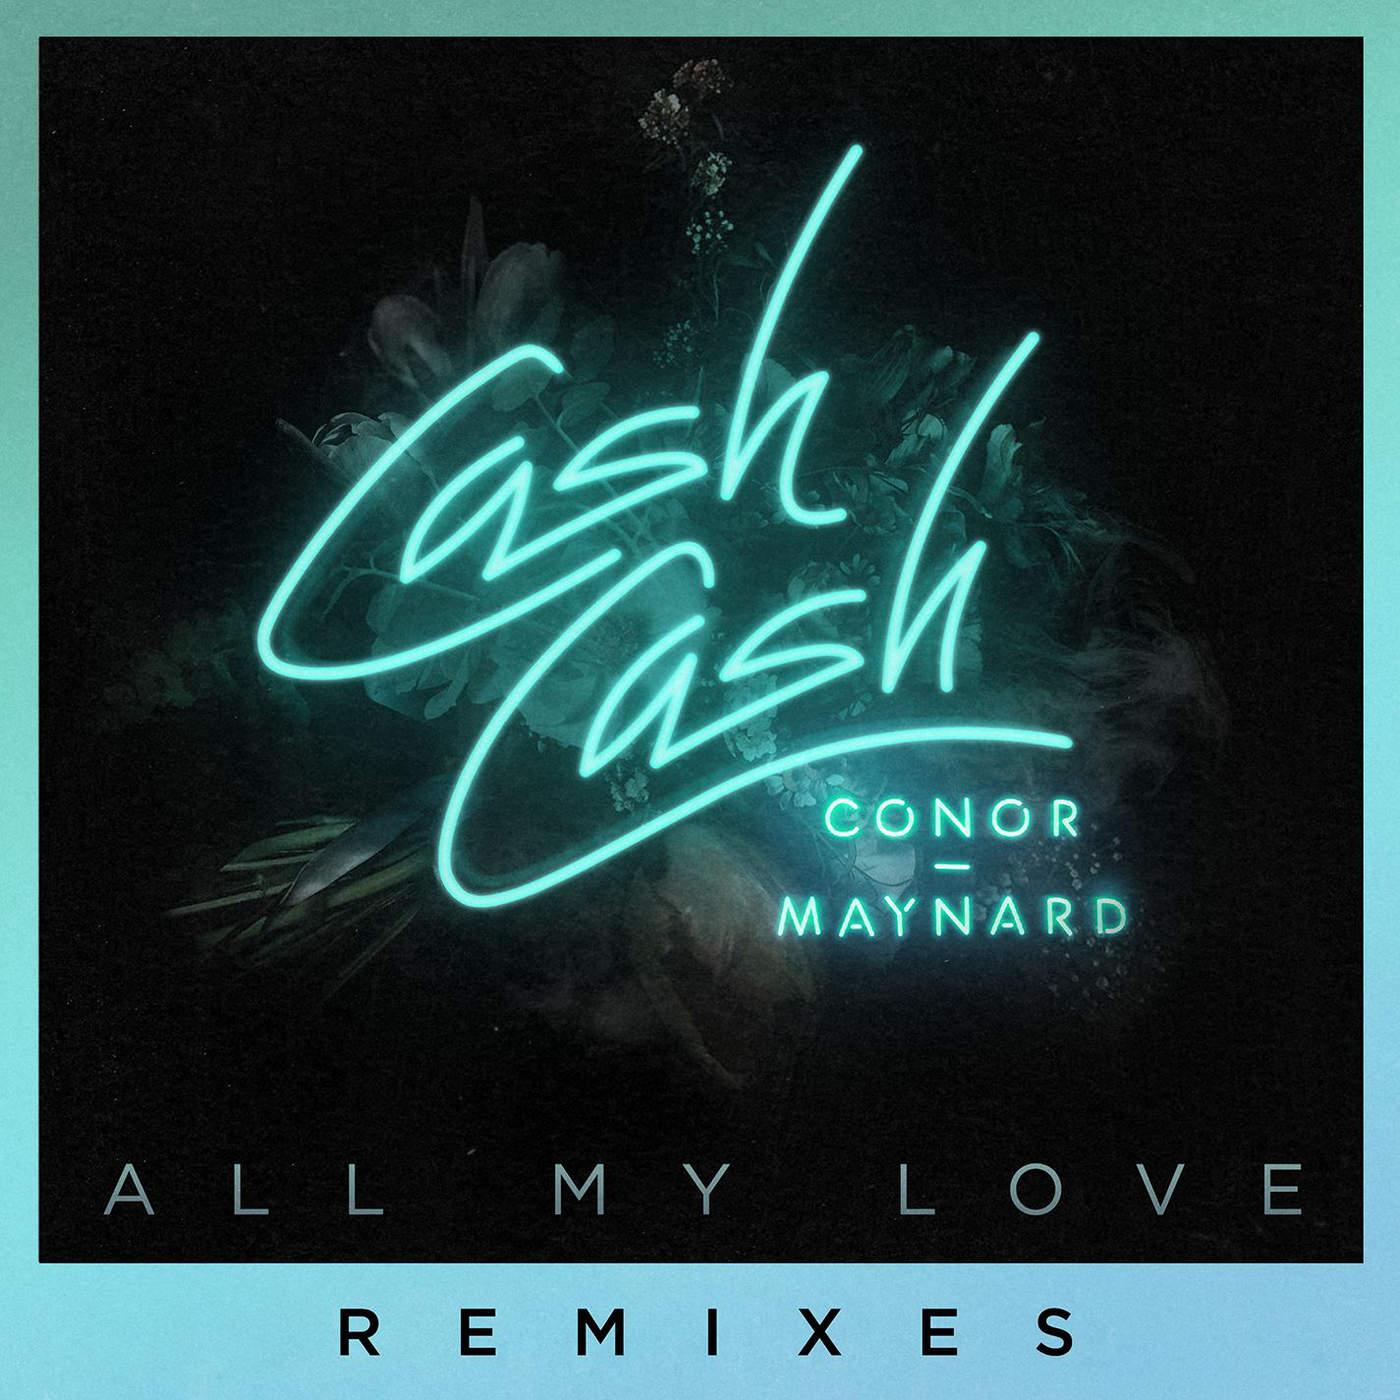 Cash Cash - All My Love (feat. Conor Maynard) [Remixes]